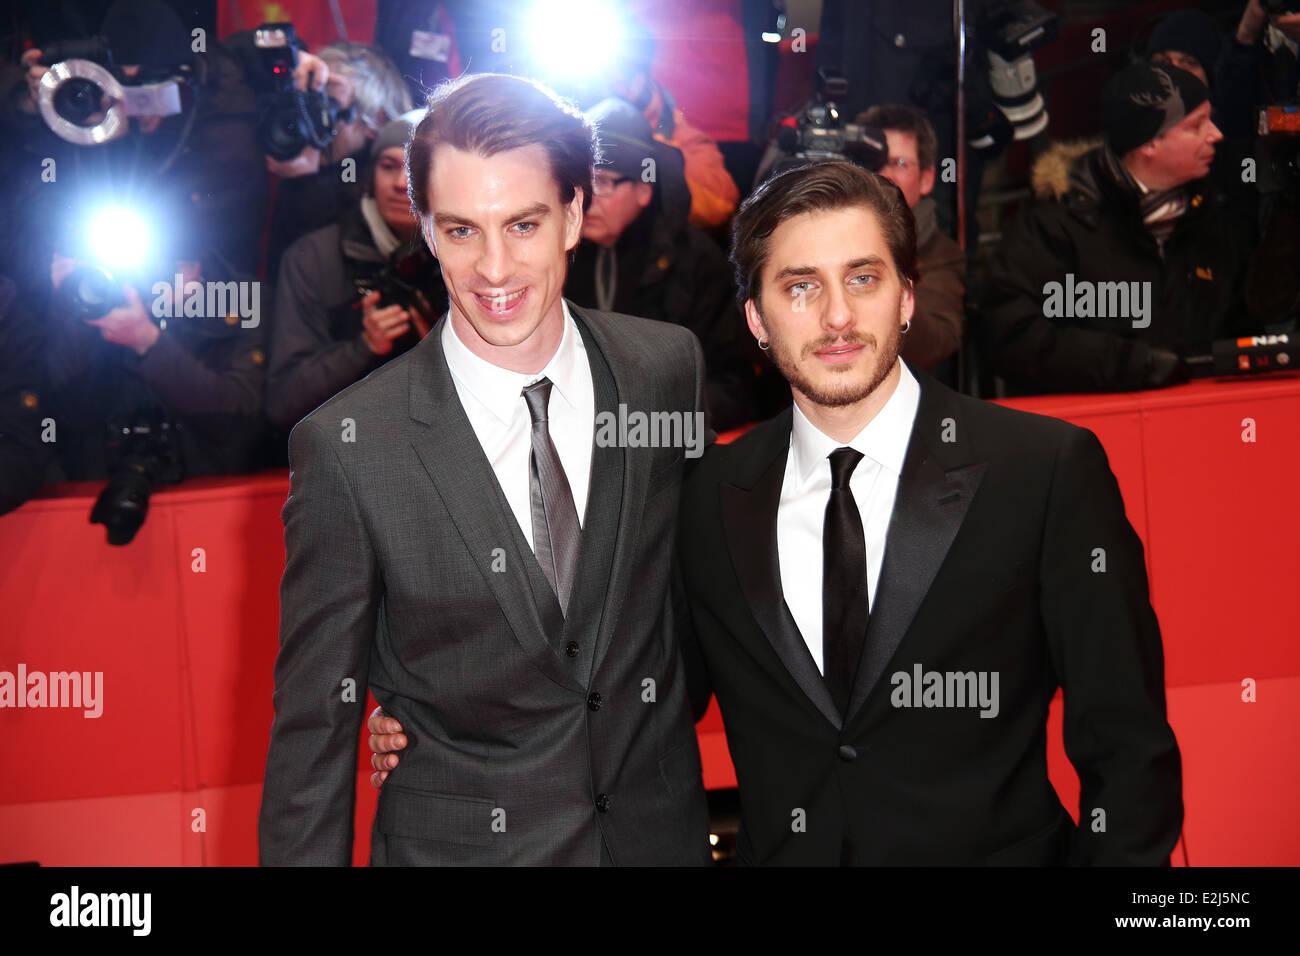 Jure Henigman and Luca Marinelli at 63rd Berlin International Film Festival (Berlinale) - premiere Before Midnight - Stock Image